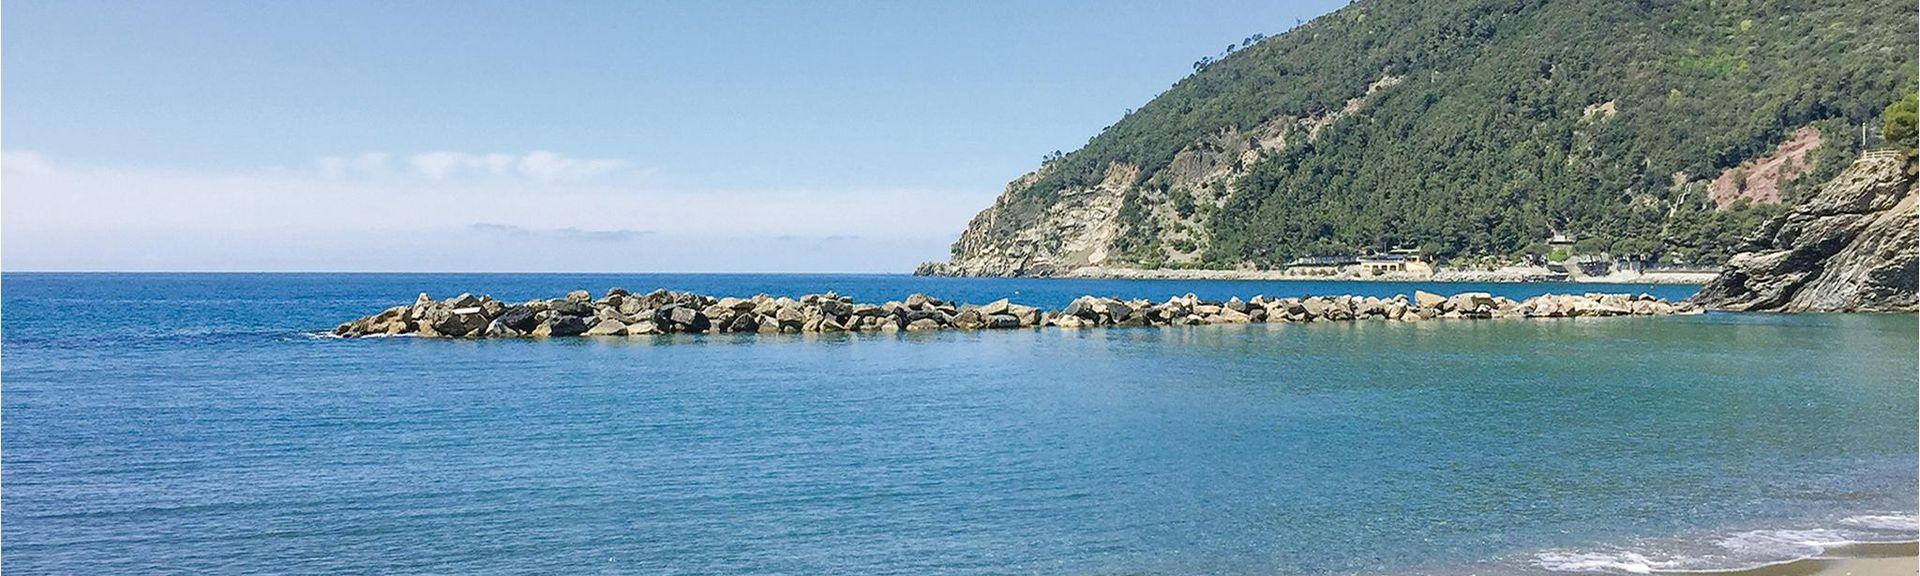 Praia de Camogli, Camogli, Ligúria, Itália